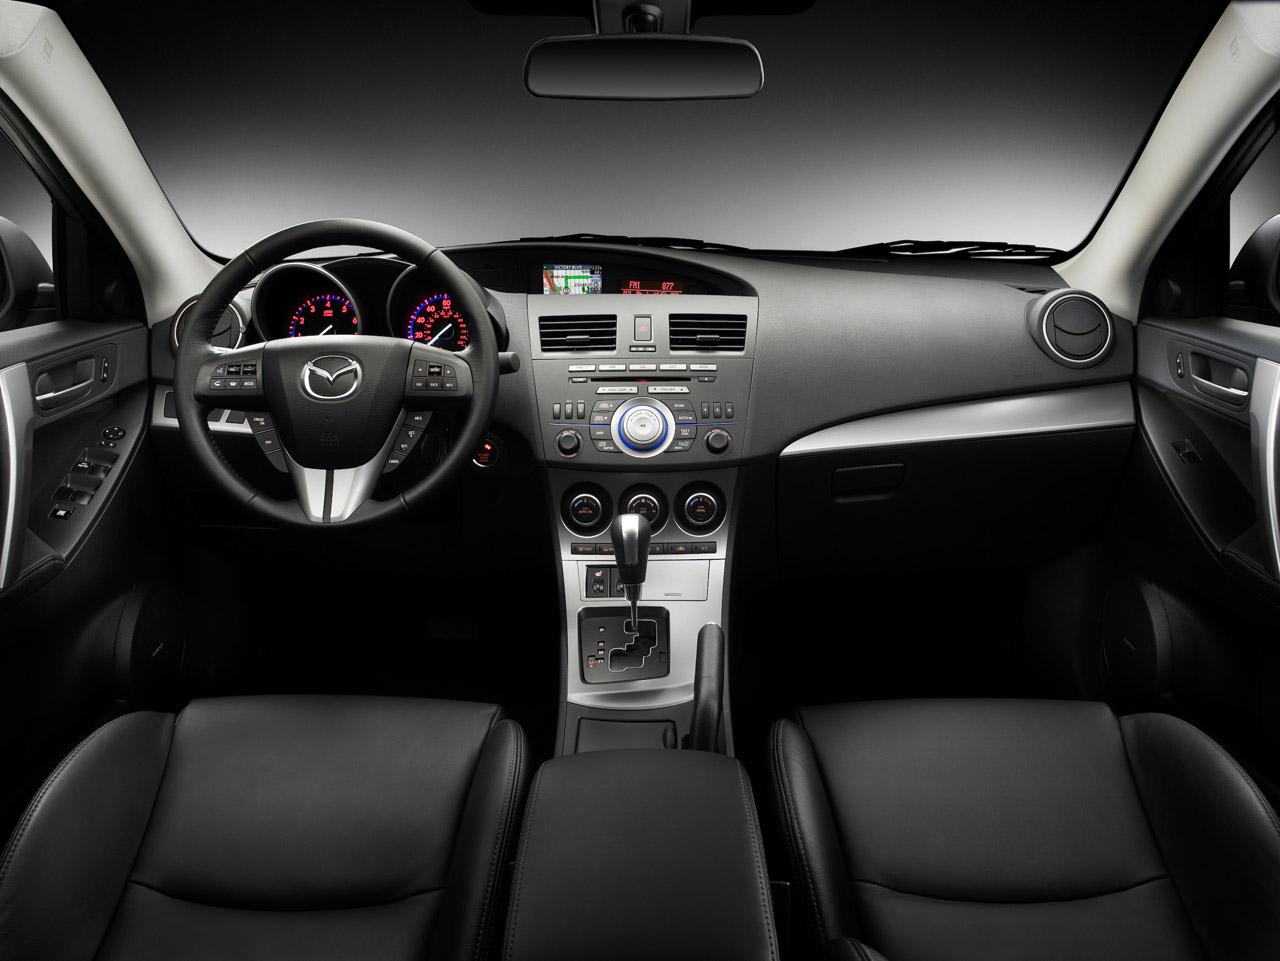 Mazda Sees Daylight In La on 2014 Mazda 3 Engine